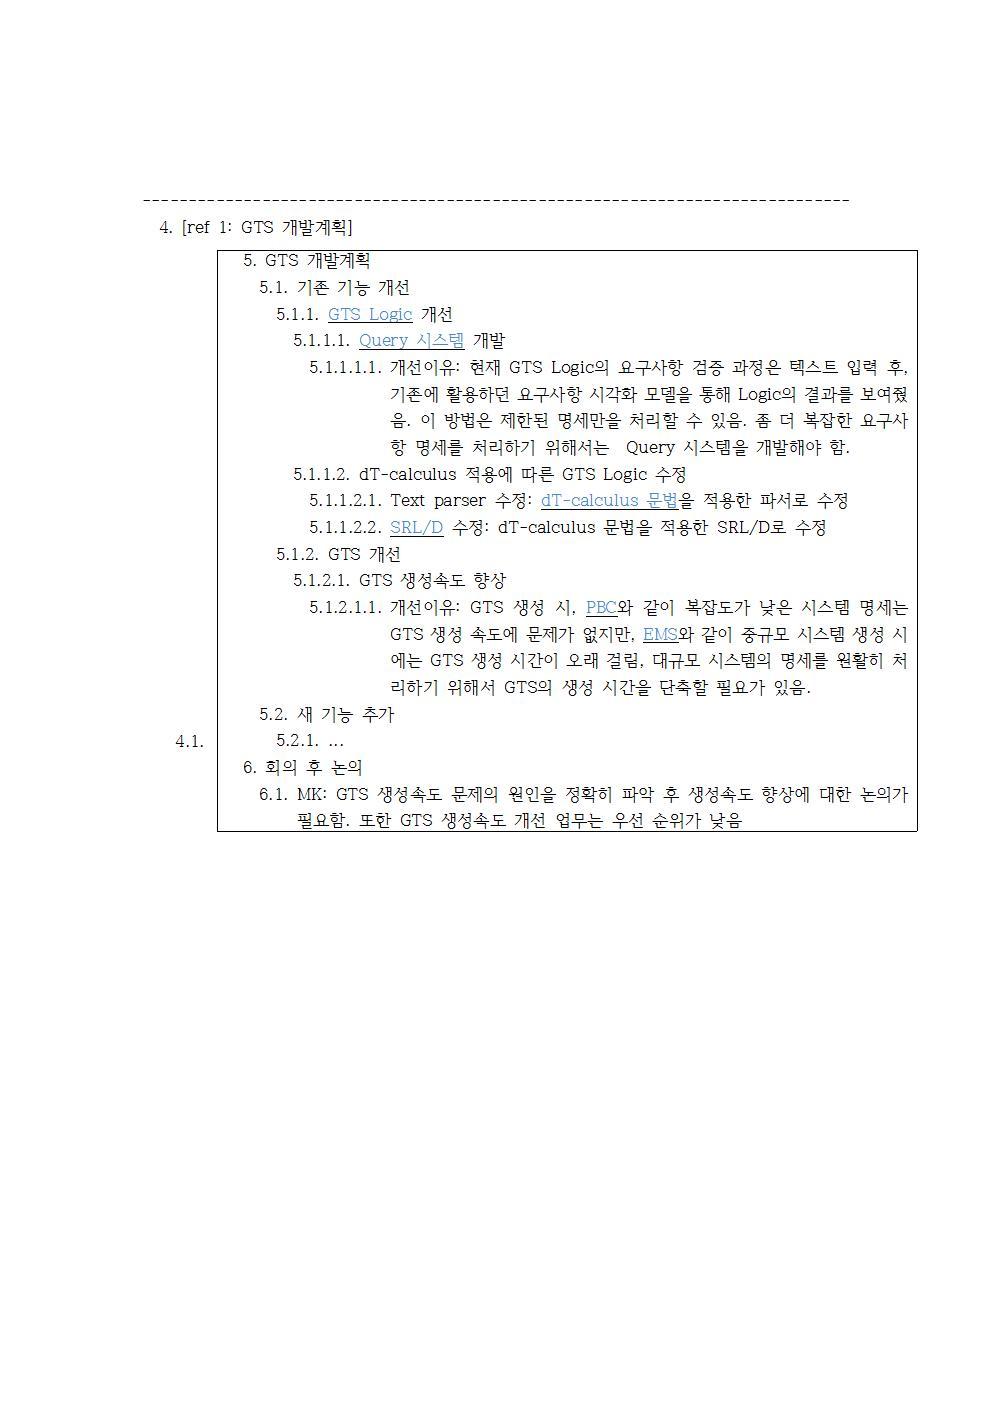 D-[17-103-RD-01]-[inTechOpenJournal-dT-Calculus-[SH]-[2017-12-23]002.jpg